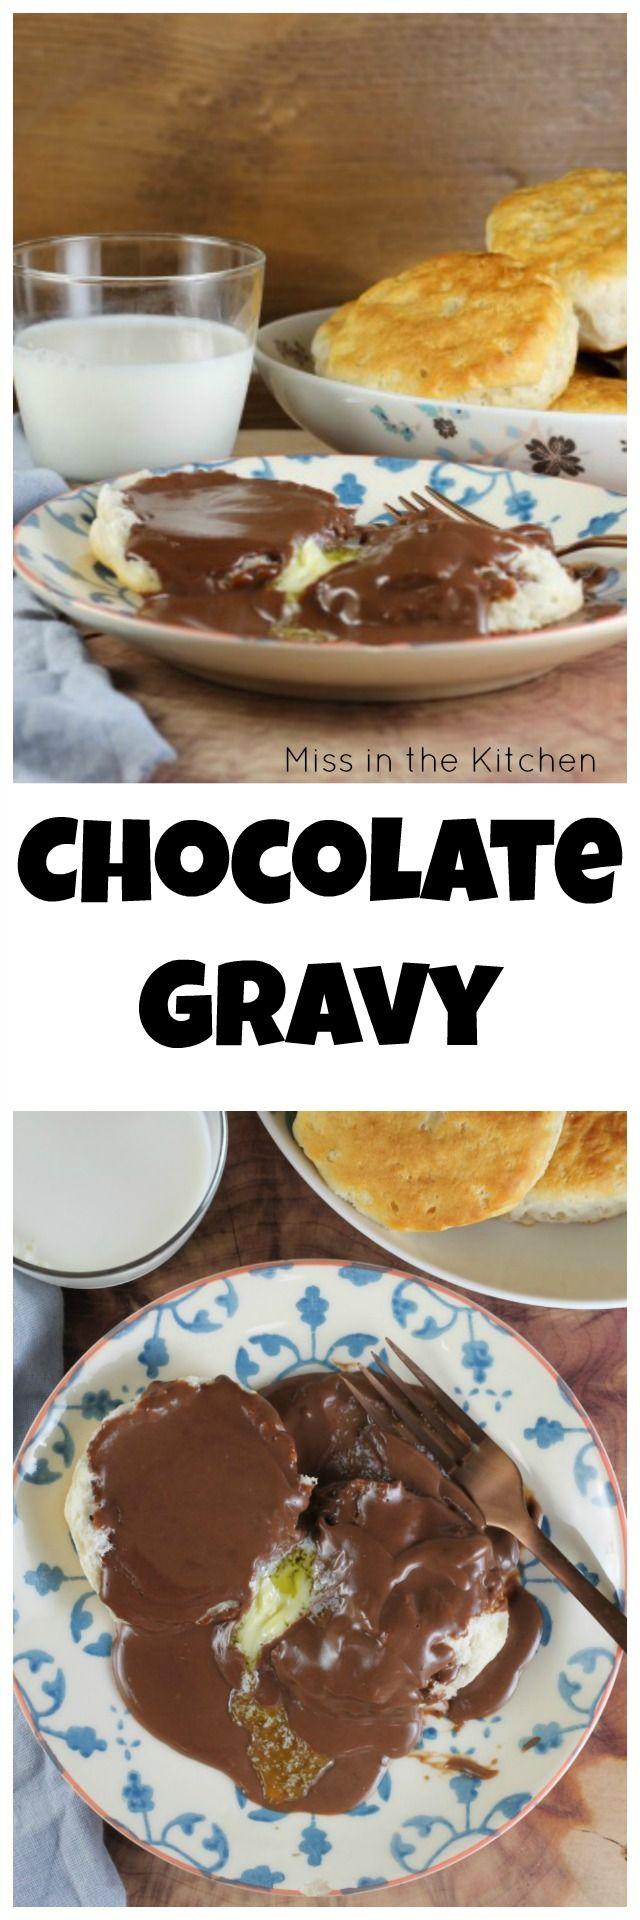 Best 25+ Chocolate gravy recipe ideas on Pinterest | Heat lumps ...